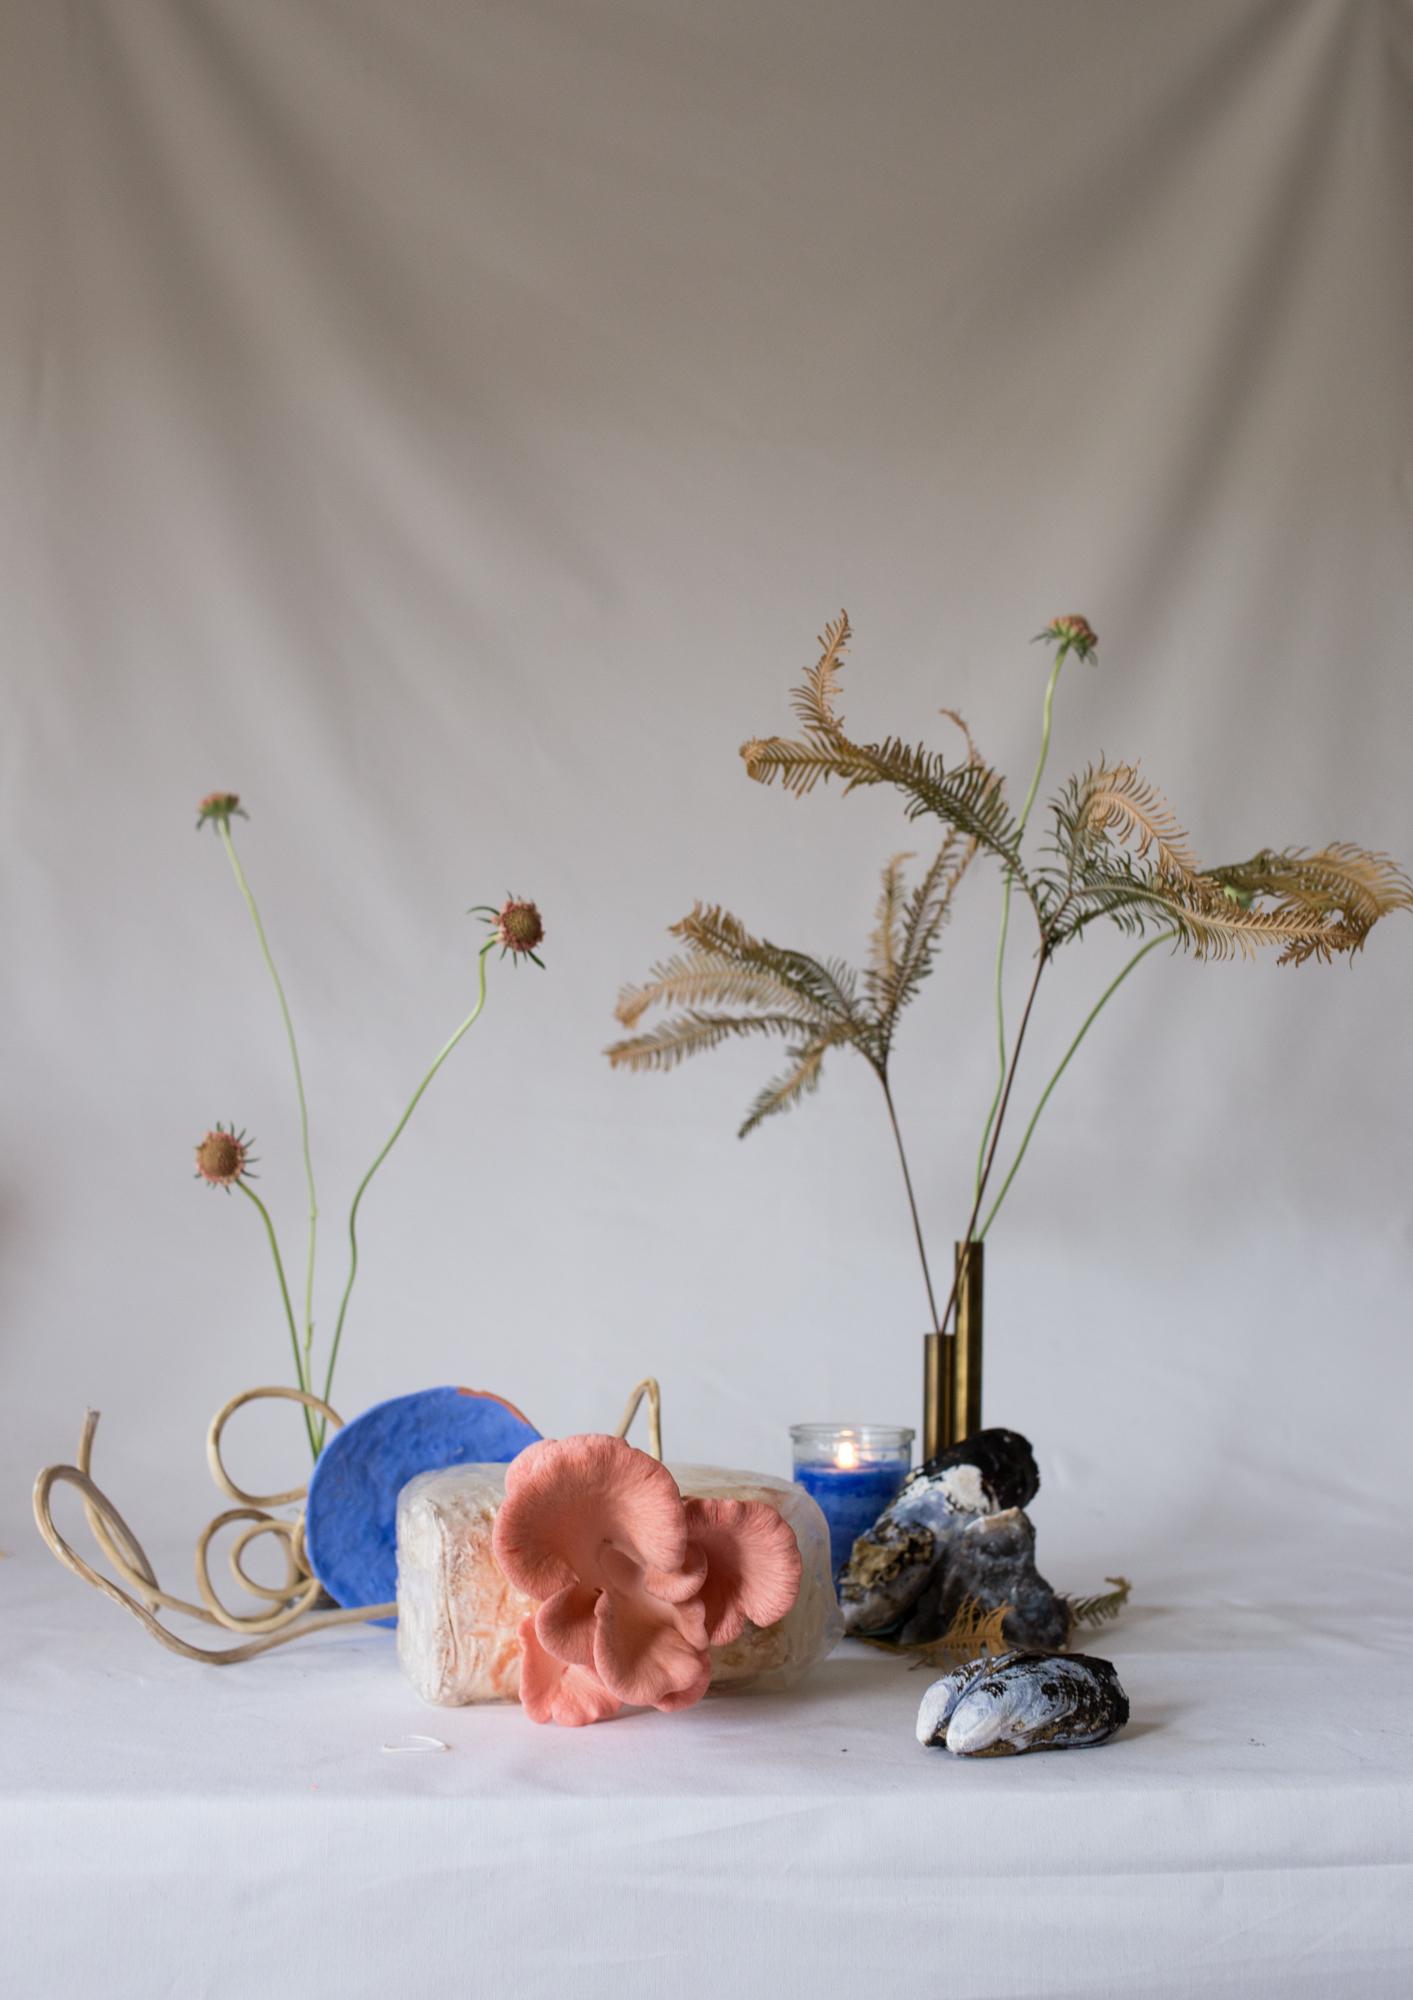 08232018-milkweed-9137.jpg